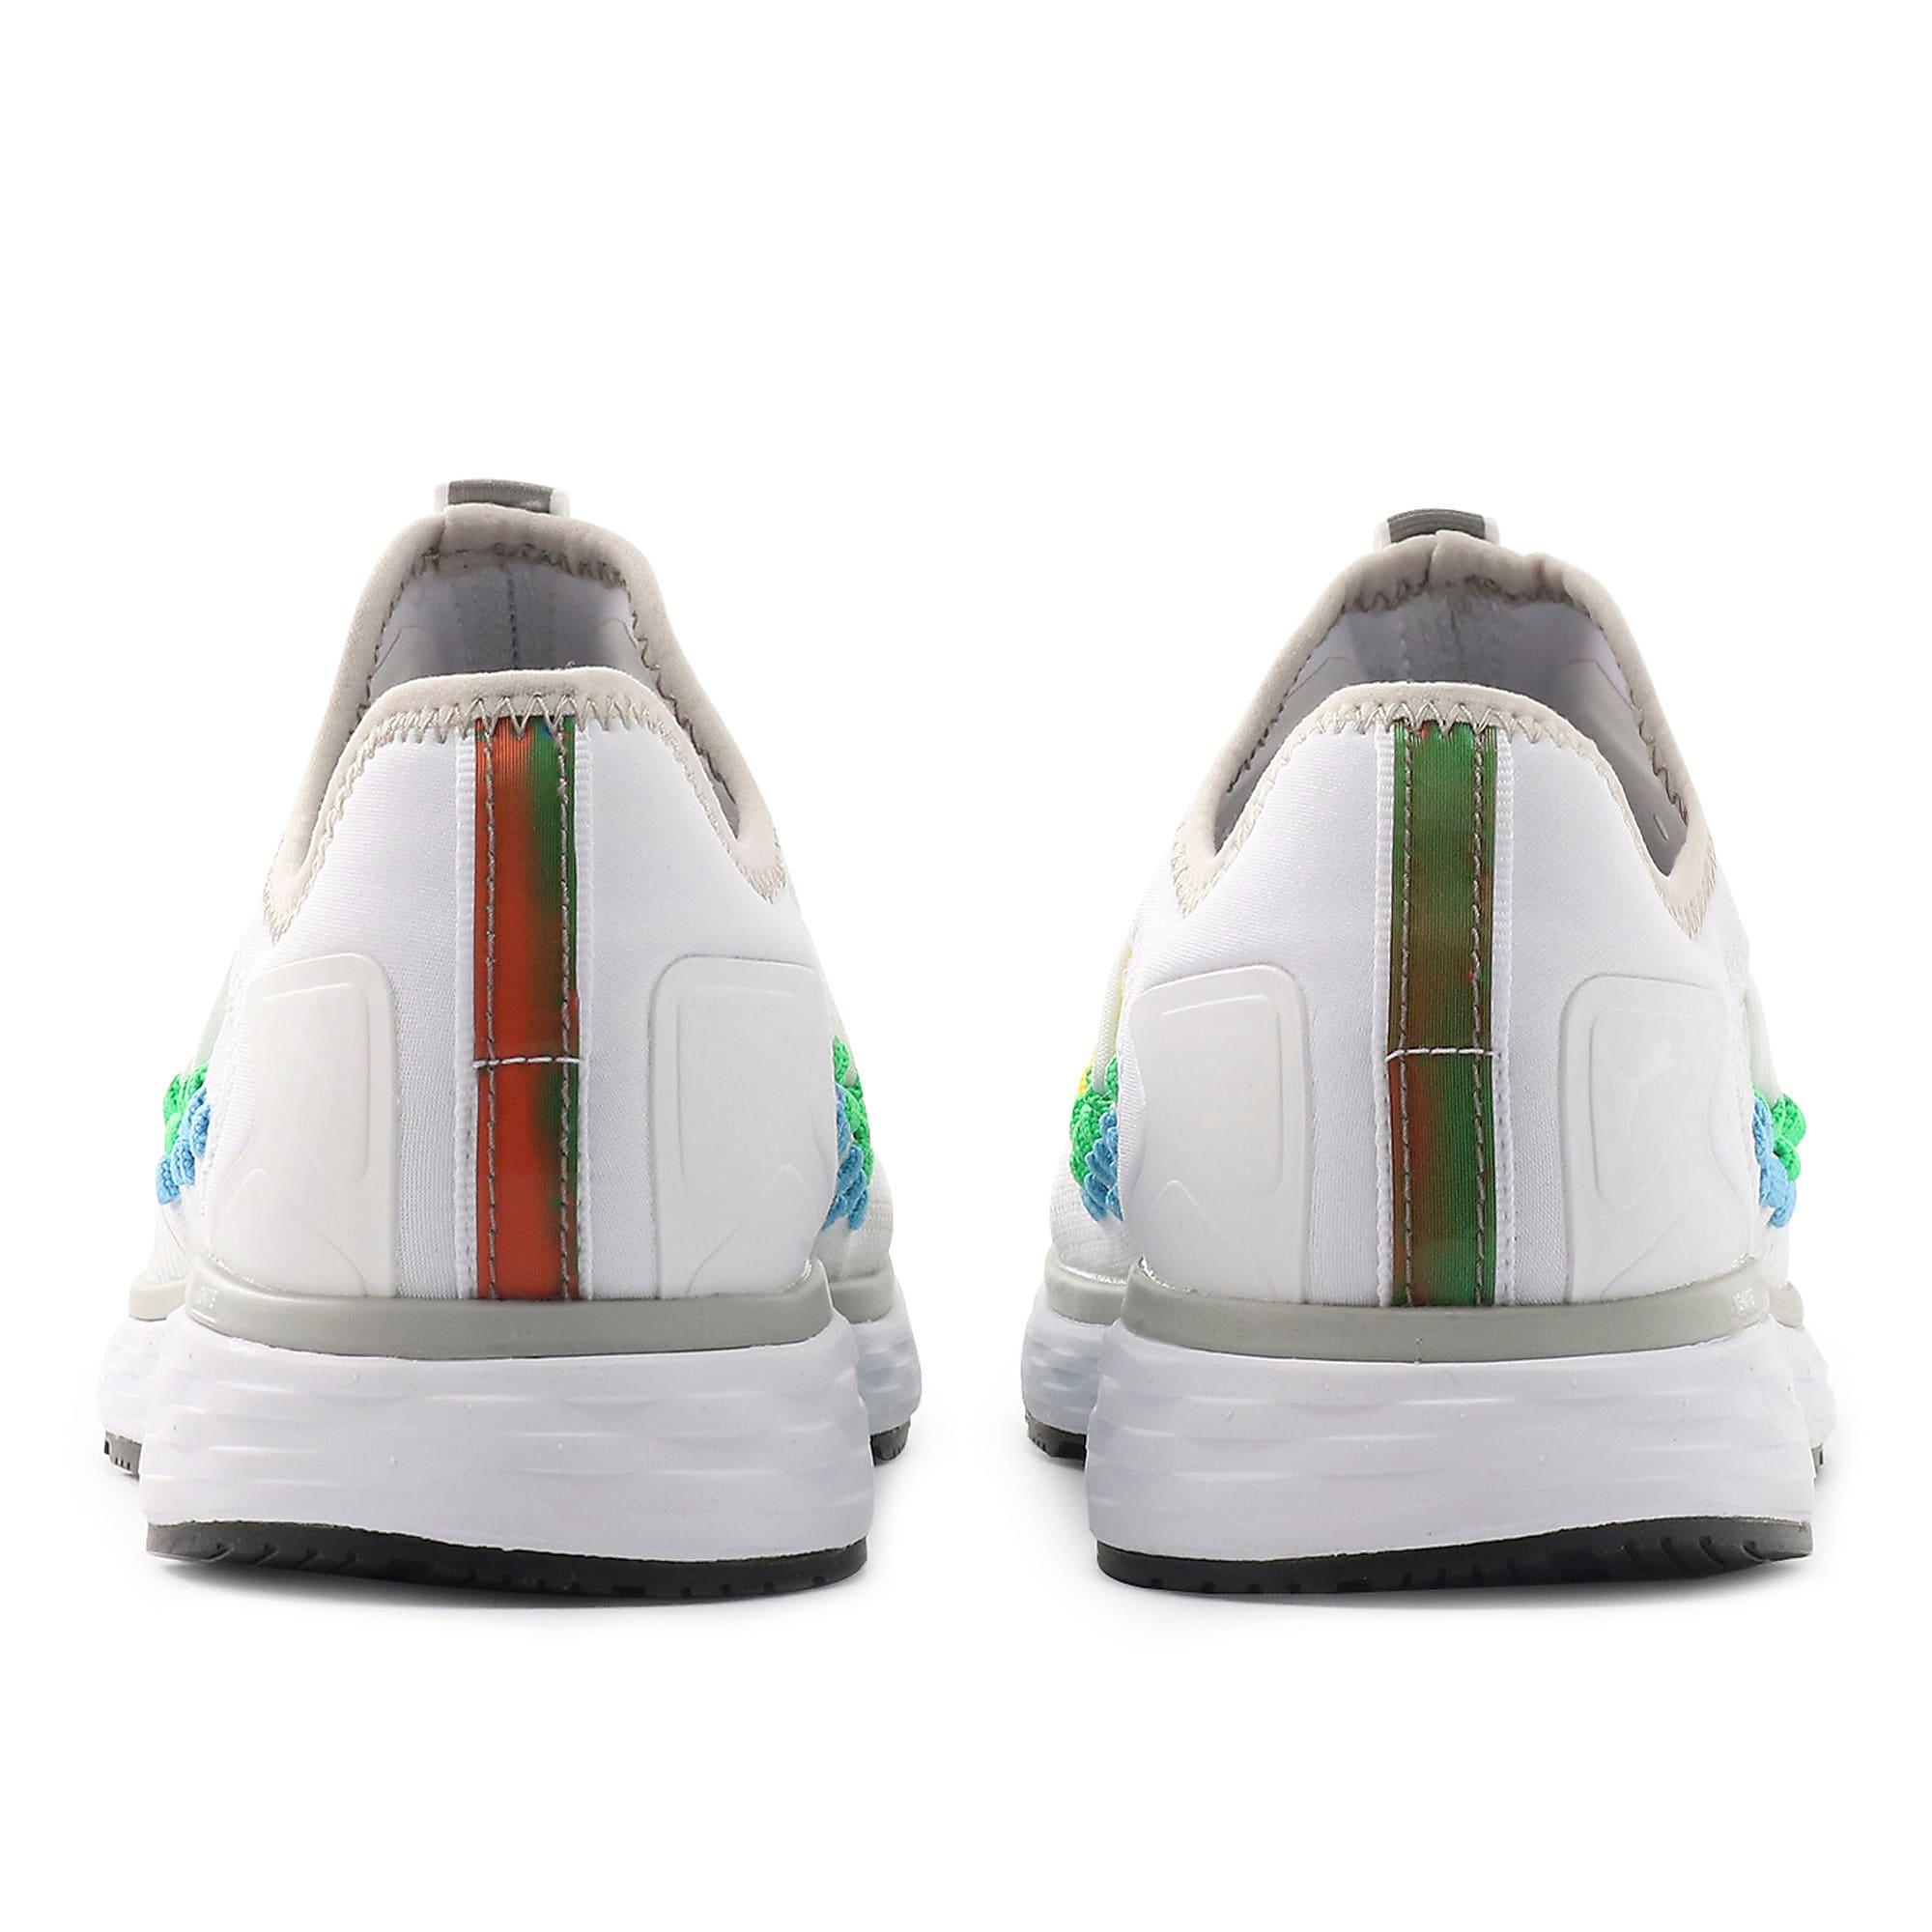 Thumbnail 3 of Speed 600 FUSEFIT Women's Running Sneakers, Puma White, medium-IND